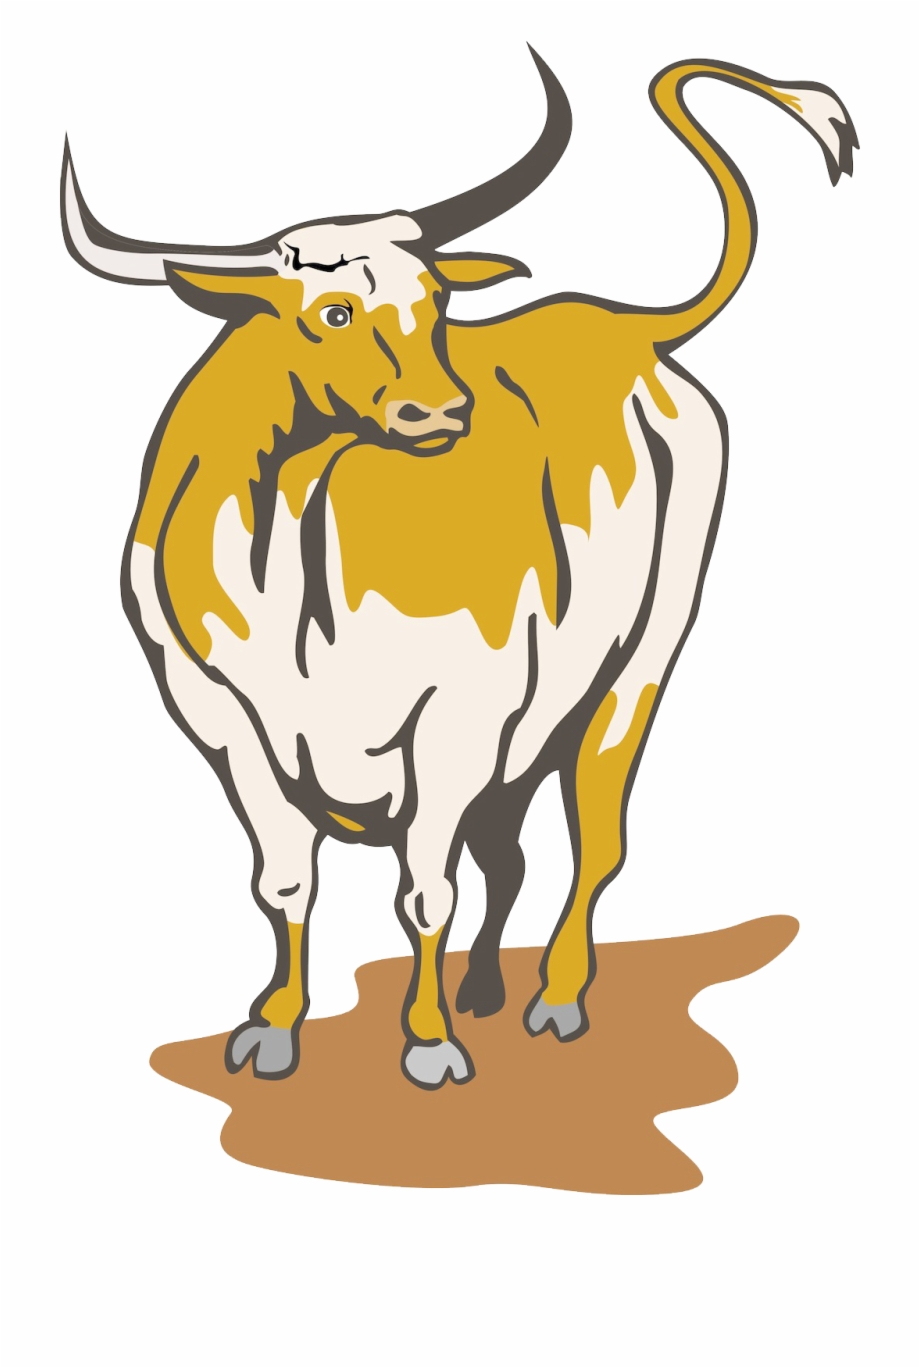 Longhorn clipart horns. Clip art download english